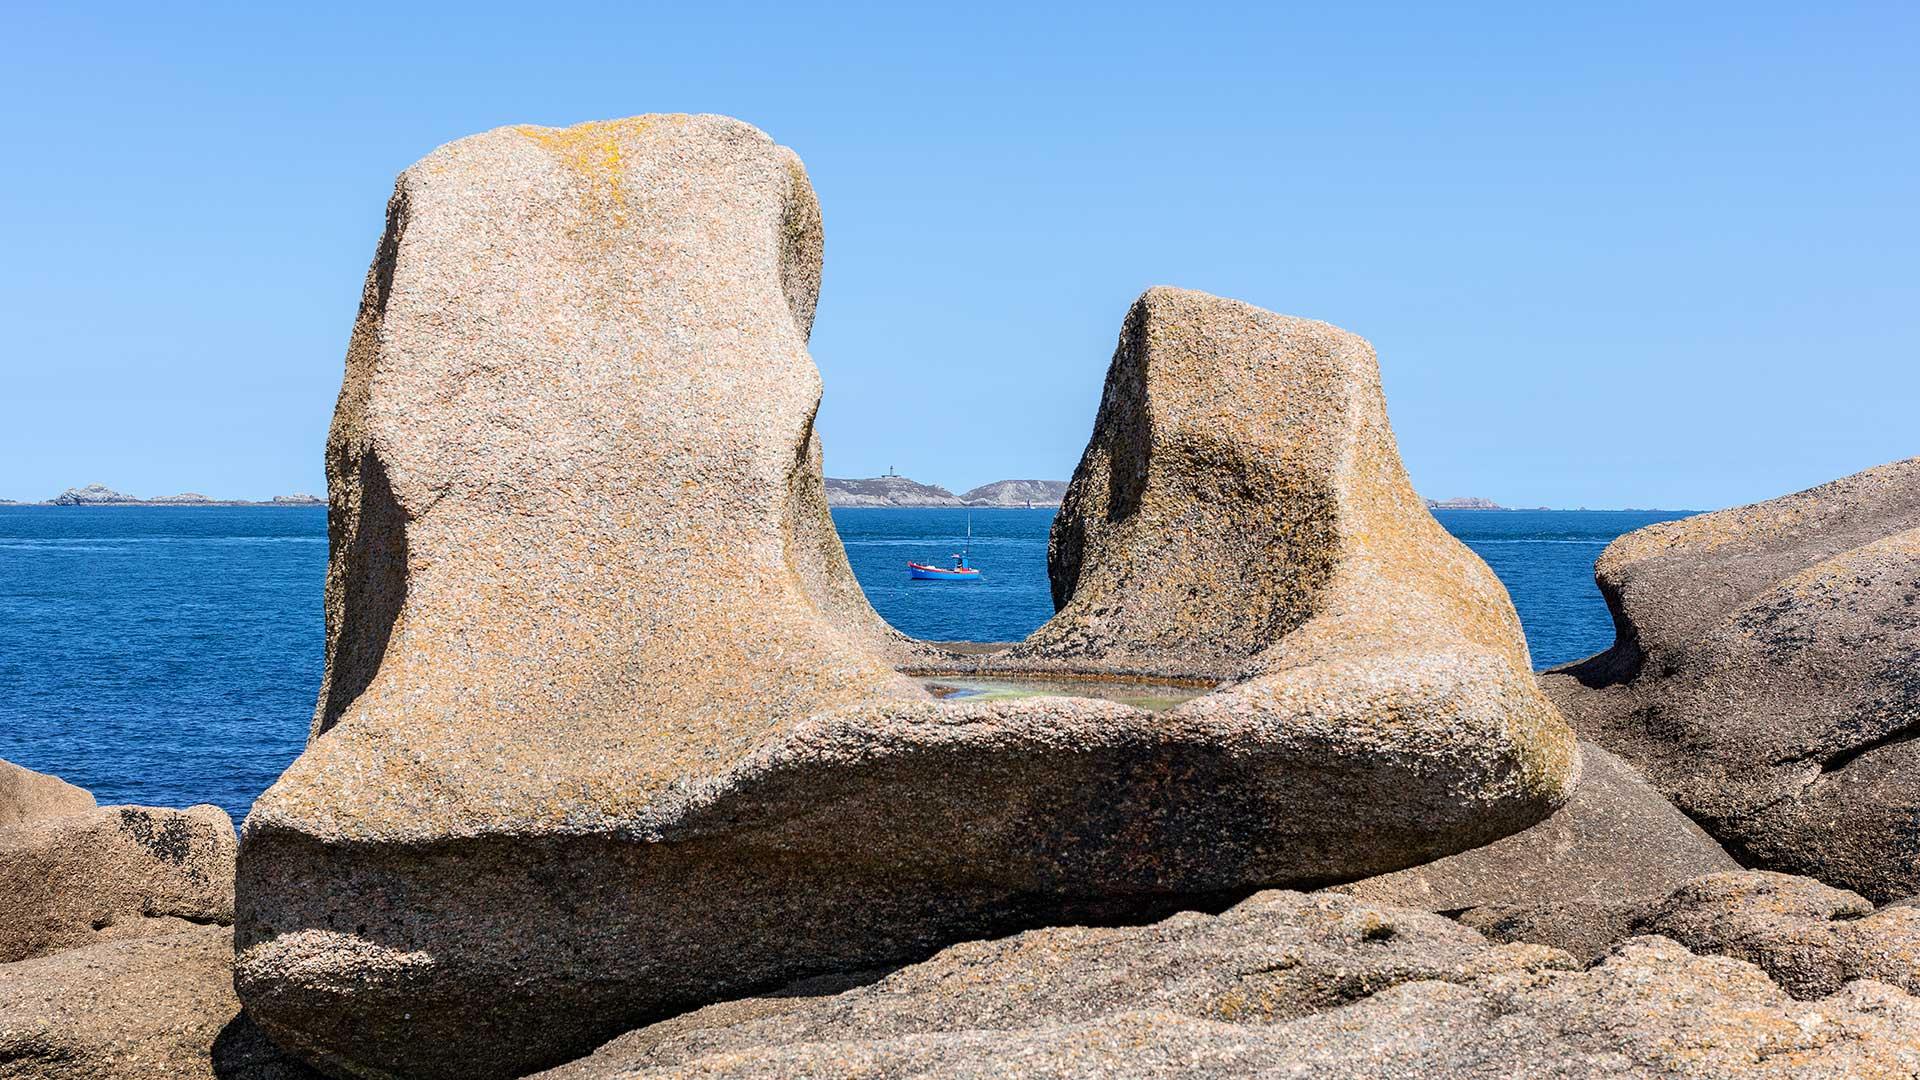 Landschaftsfotografie: Côte de Granit Rose - U-förmiger Felsen mit Boot | Foto: Dieter Eikenberg, imprints